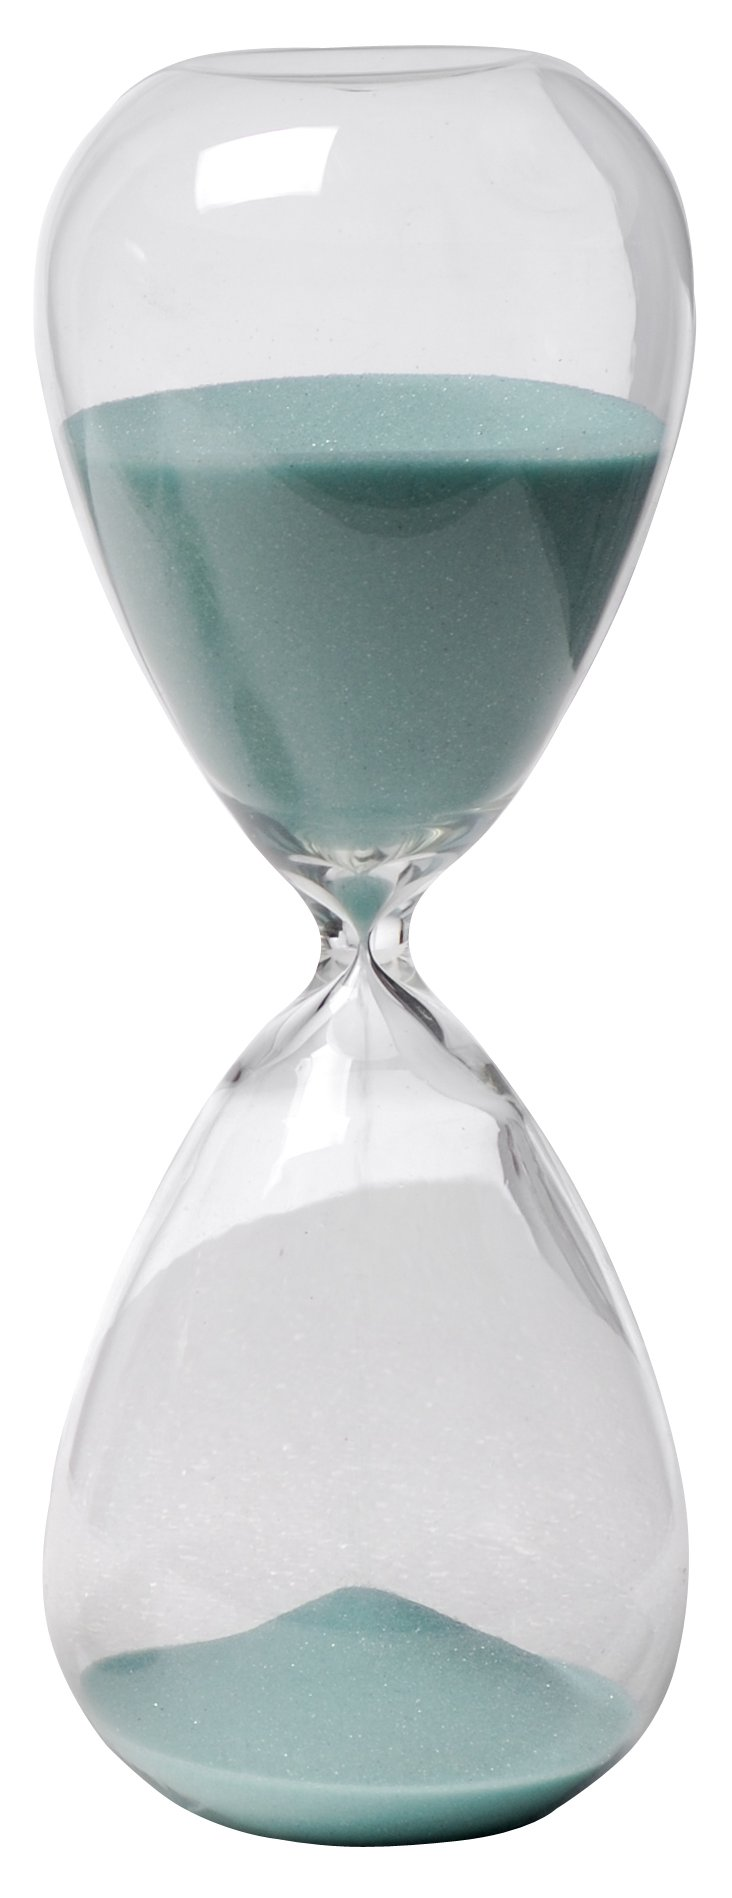 Sand Hour Glass, Jade